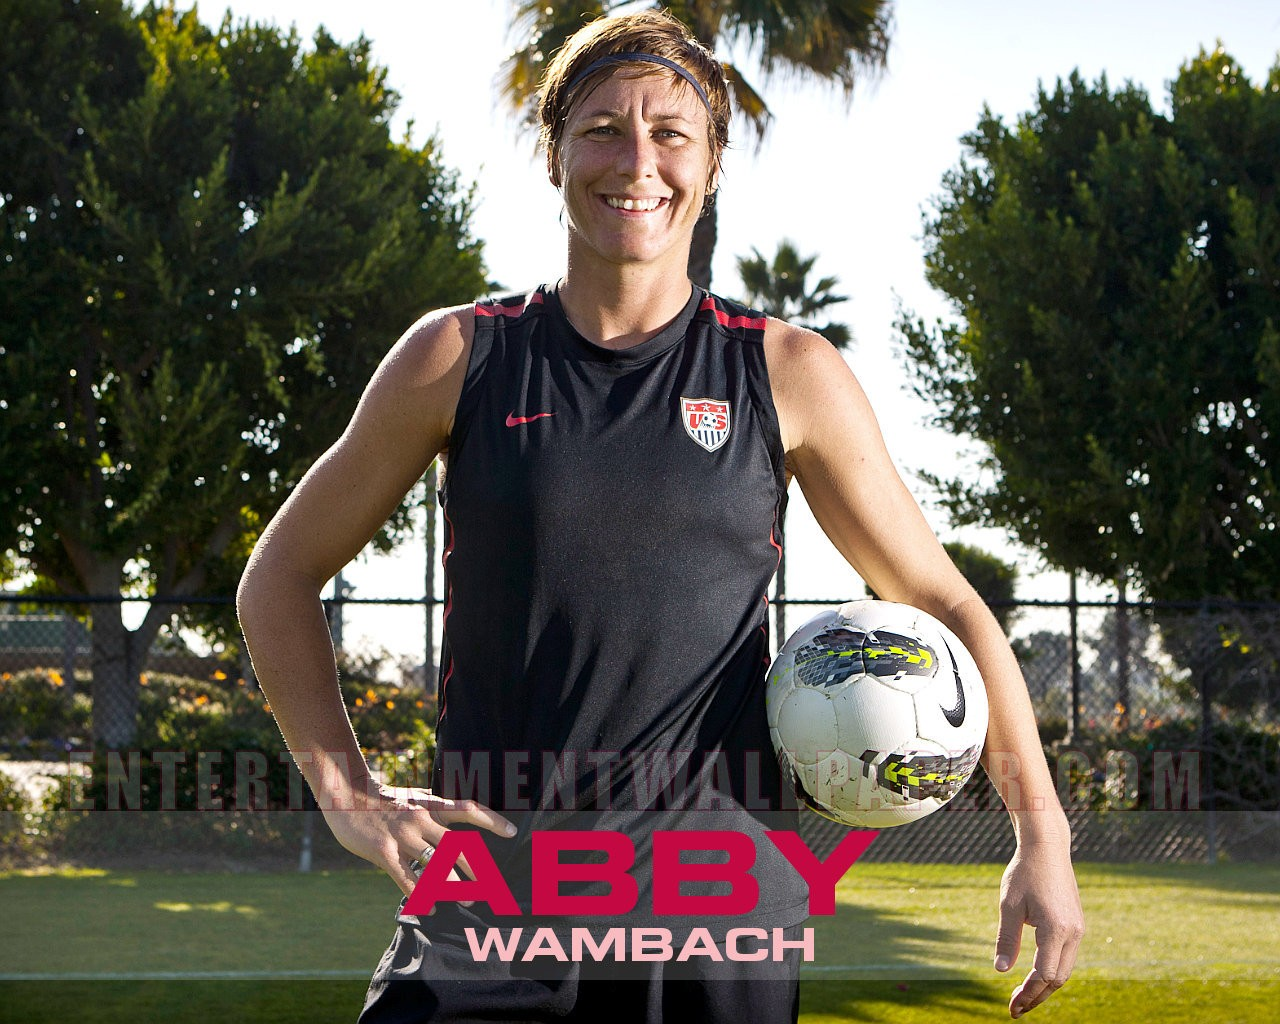 Abby Wambach Wallpaper   70030564 1280x1024 Desktop Download 1280x1024